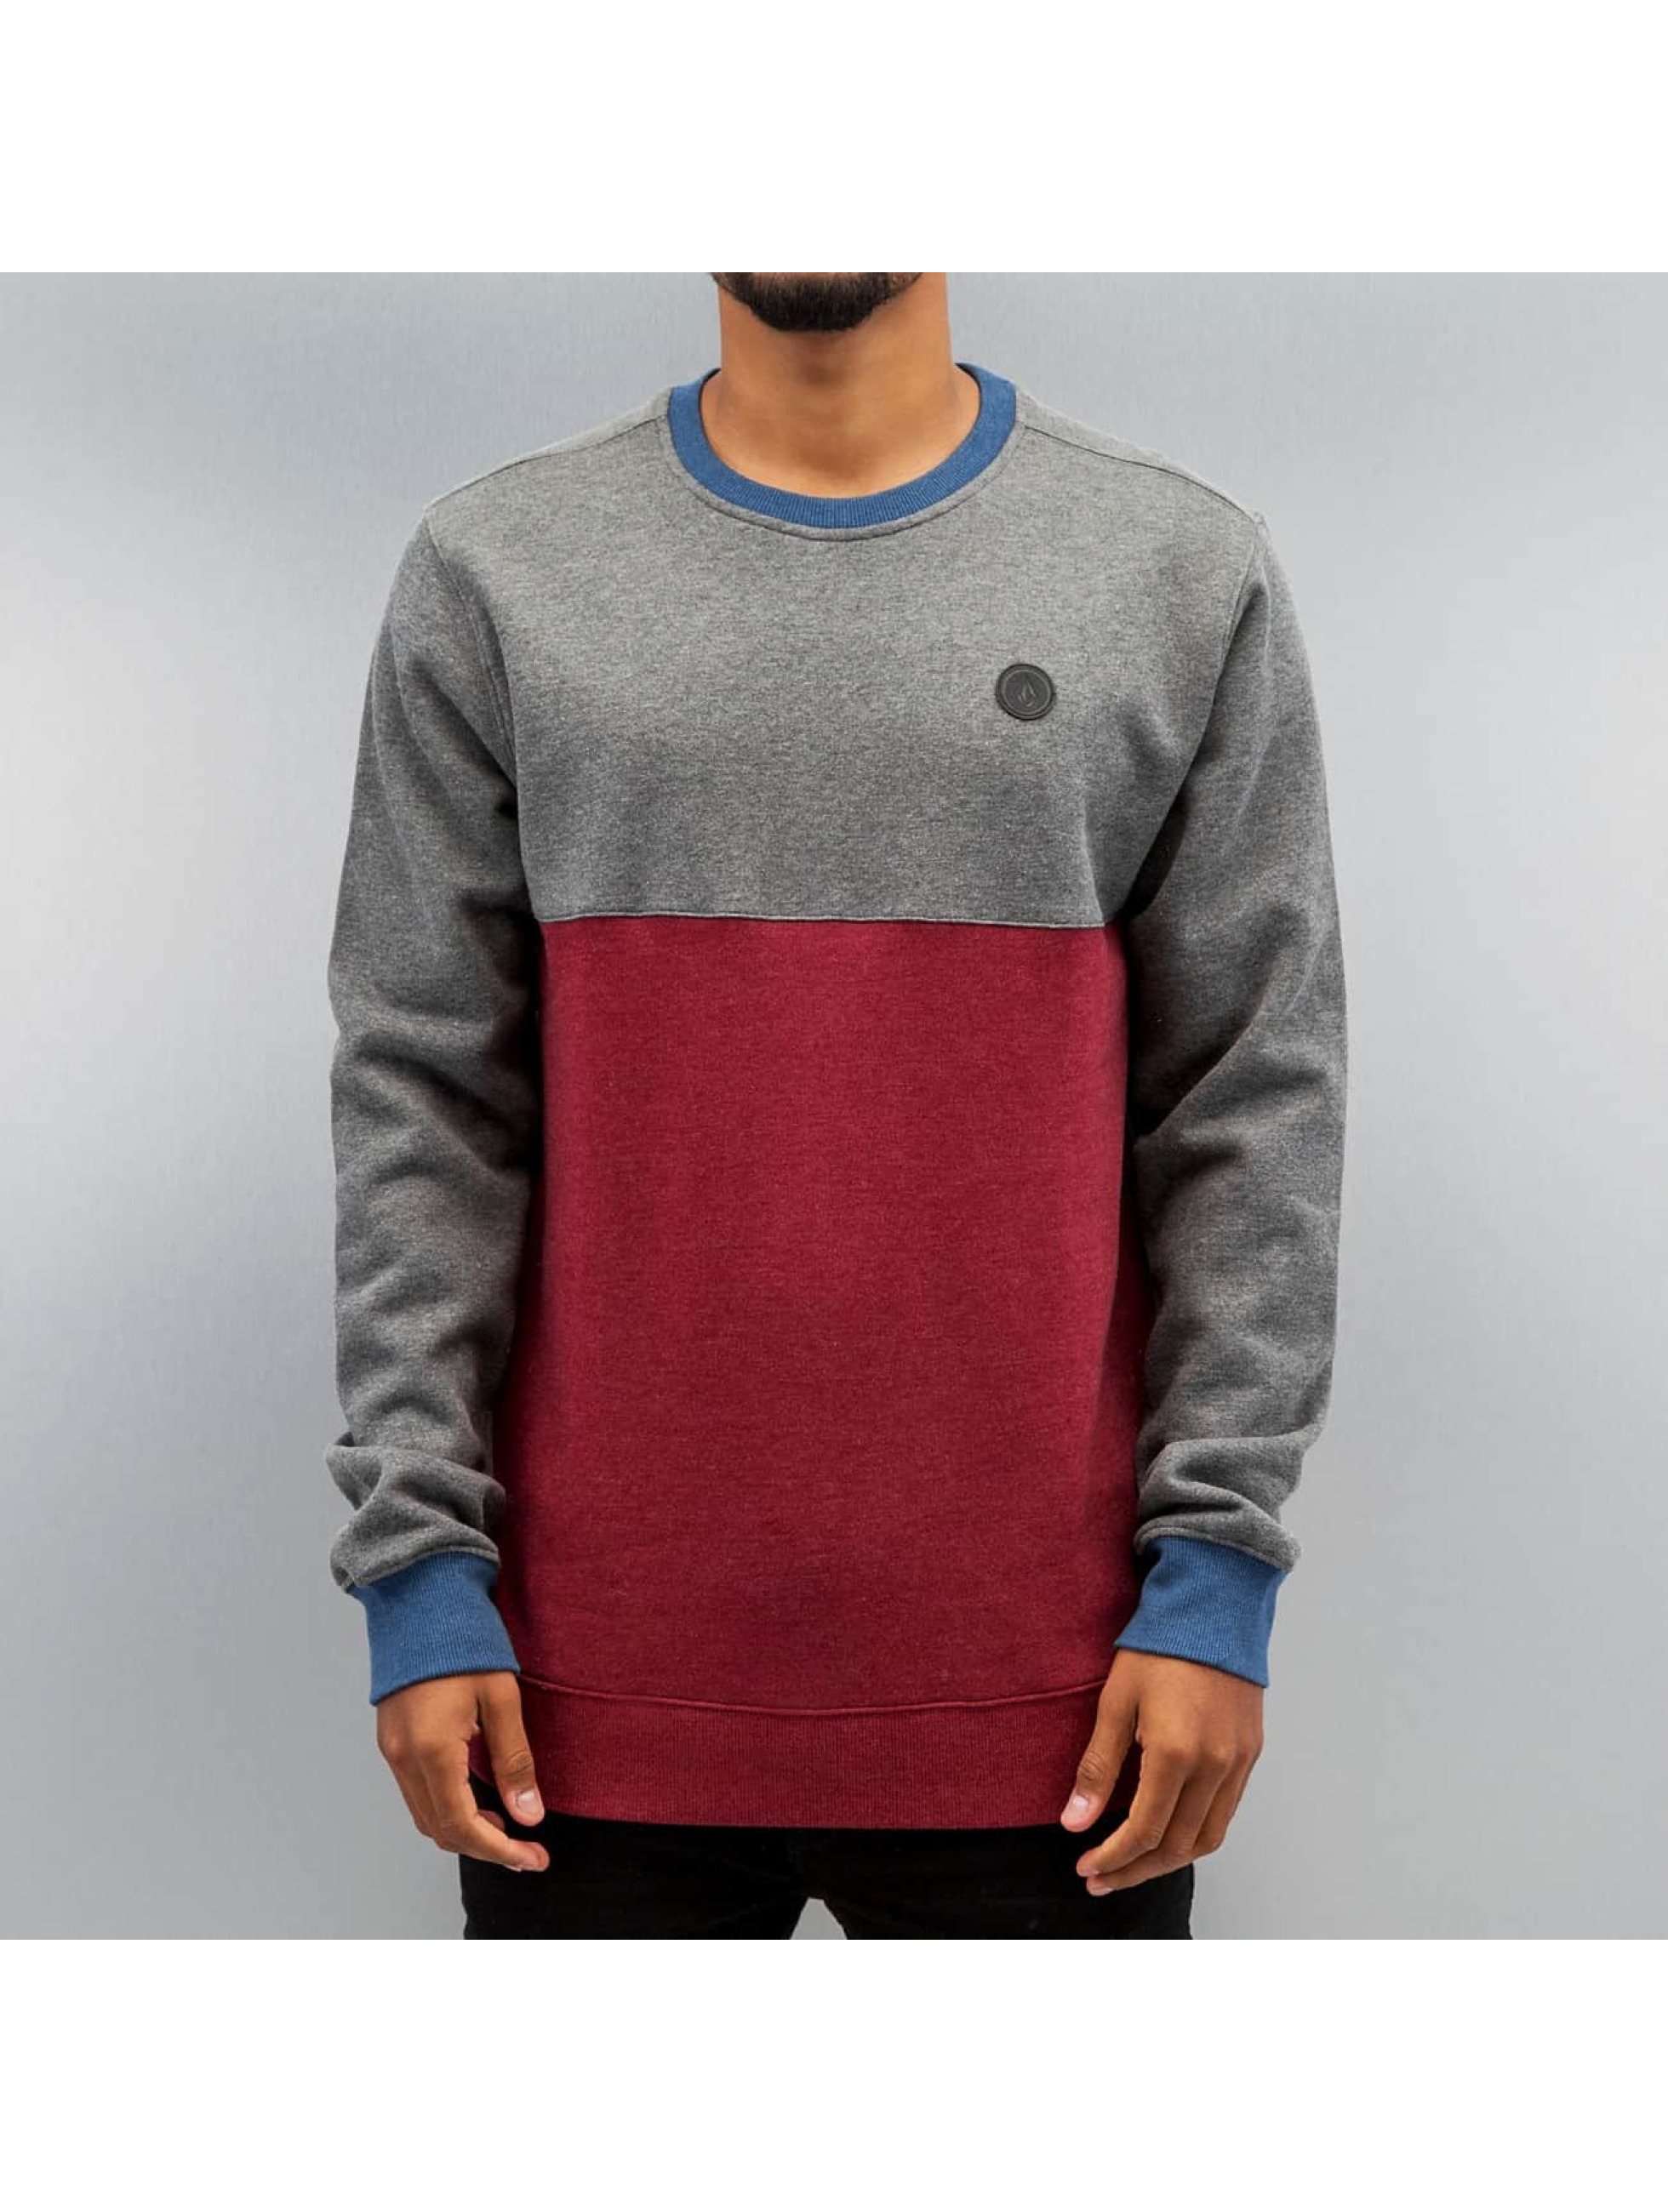 Neiße-Malxetal Angebote Volcom Männer Pullover Single Stone in grau